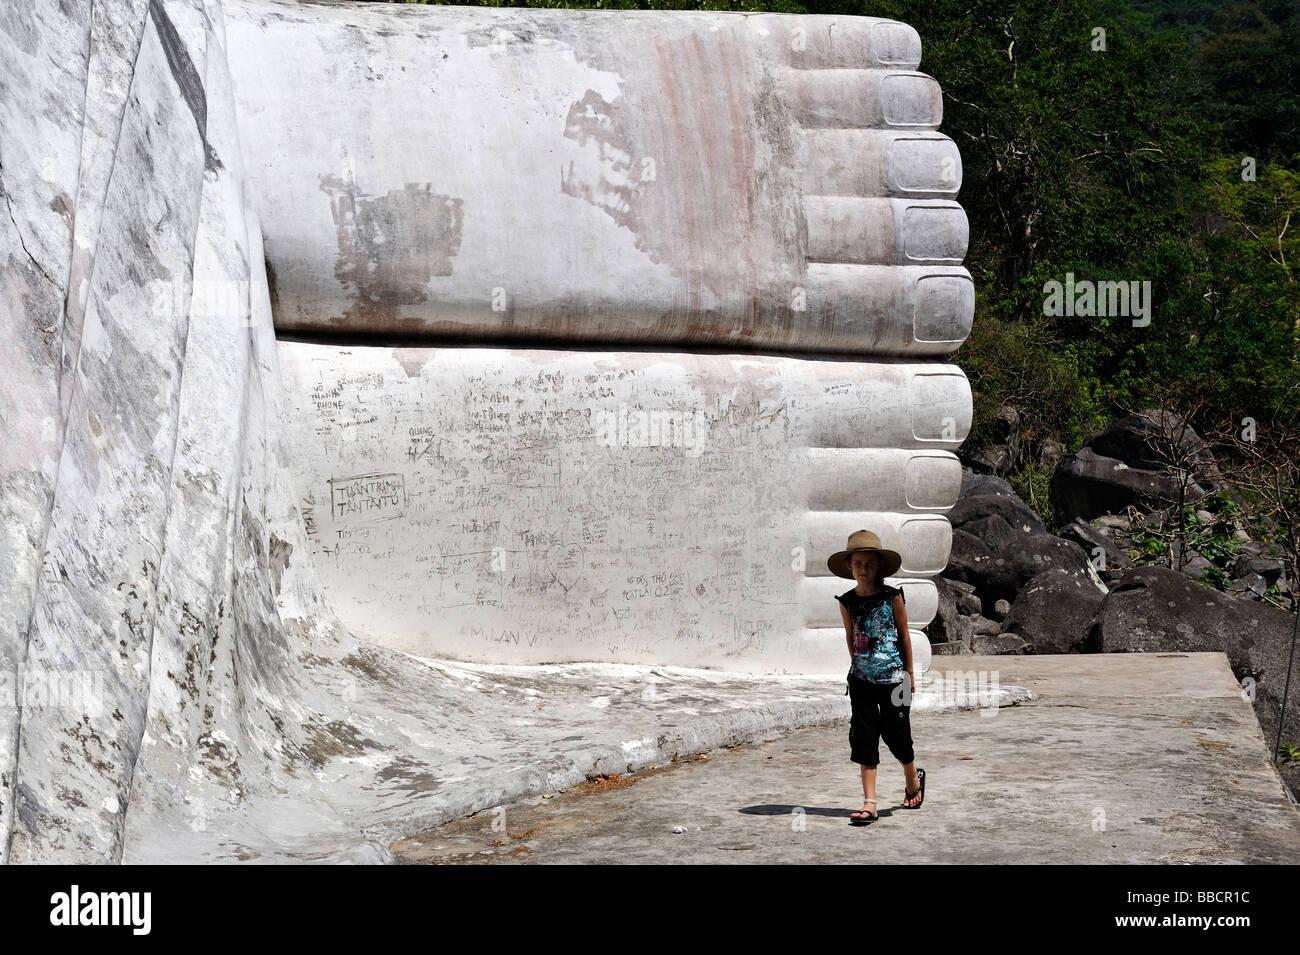 Child near graffiti covered feet of Tuong Phat Nam (white reclining Buddha), Ta Cu mountain, Binh Thuan province, - Stock Image